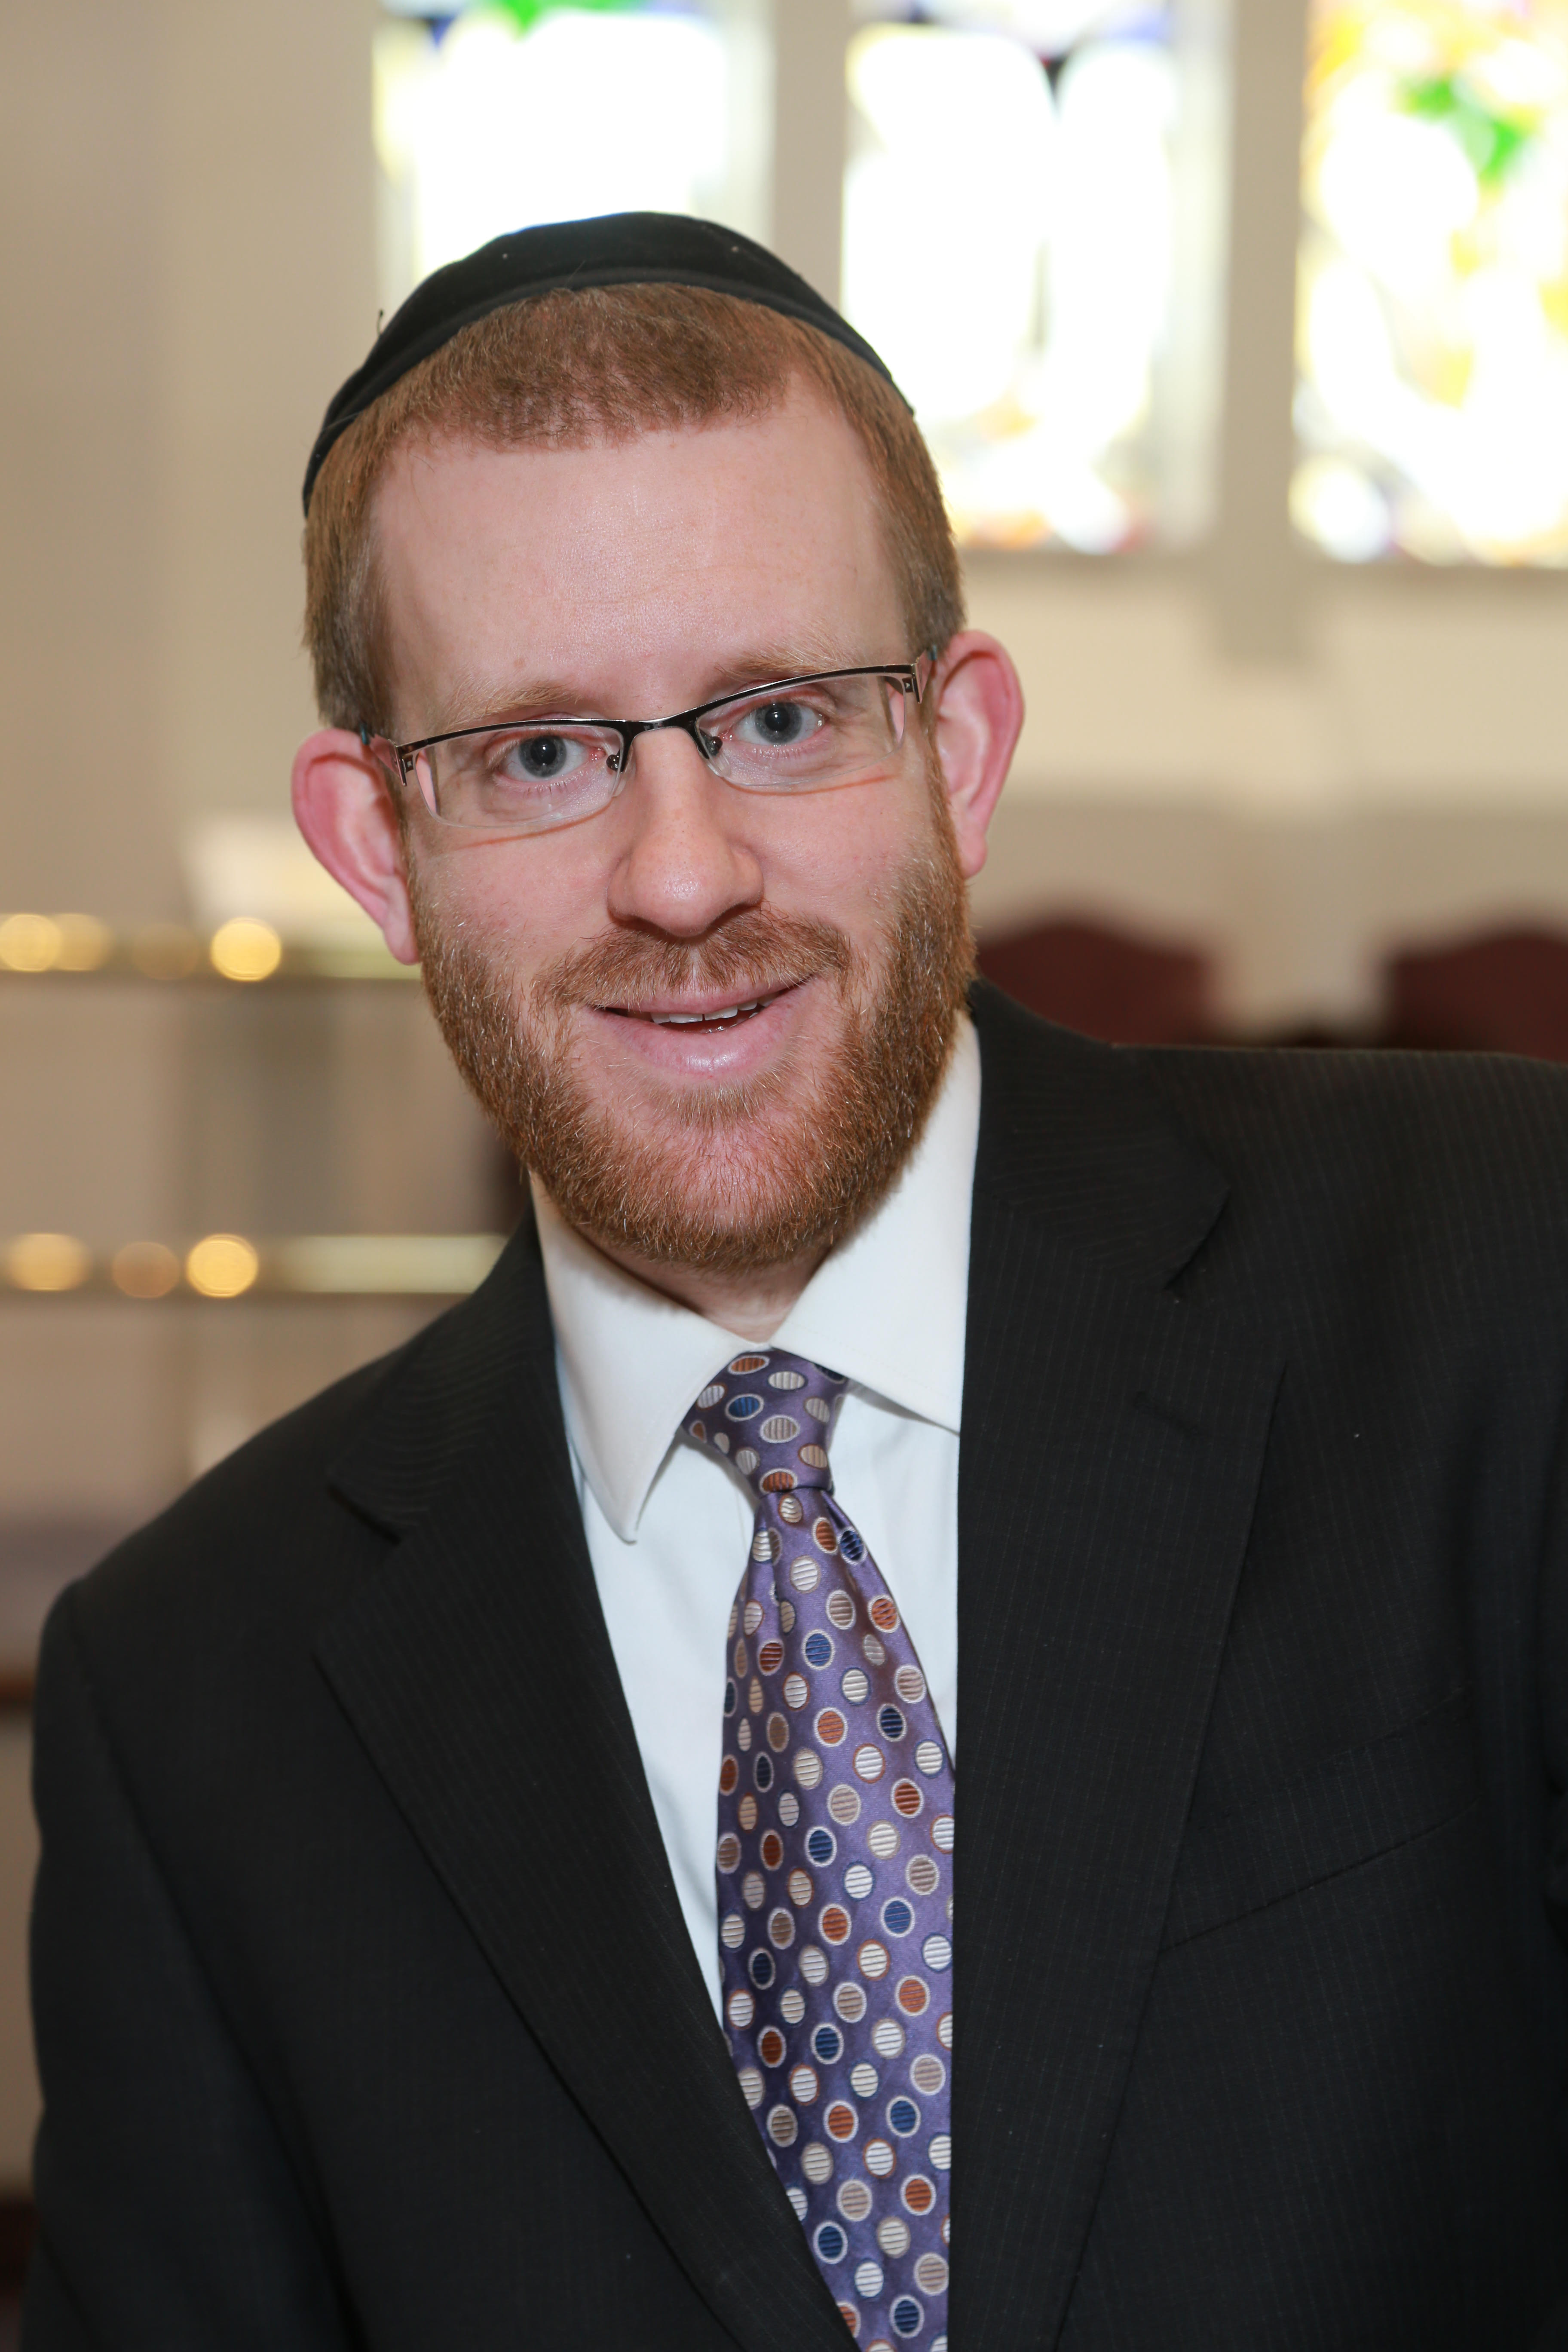 Rabbi Zevi Spitz and Family